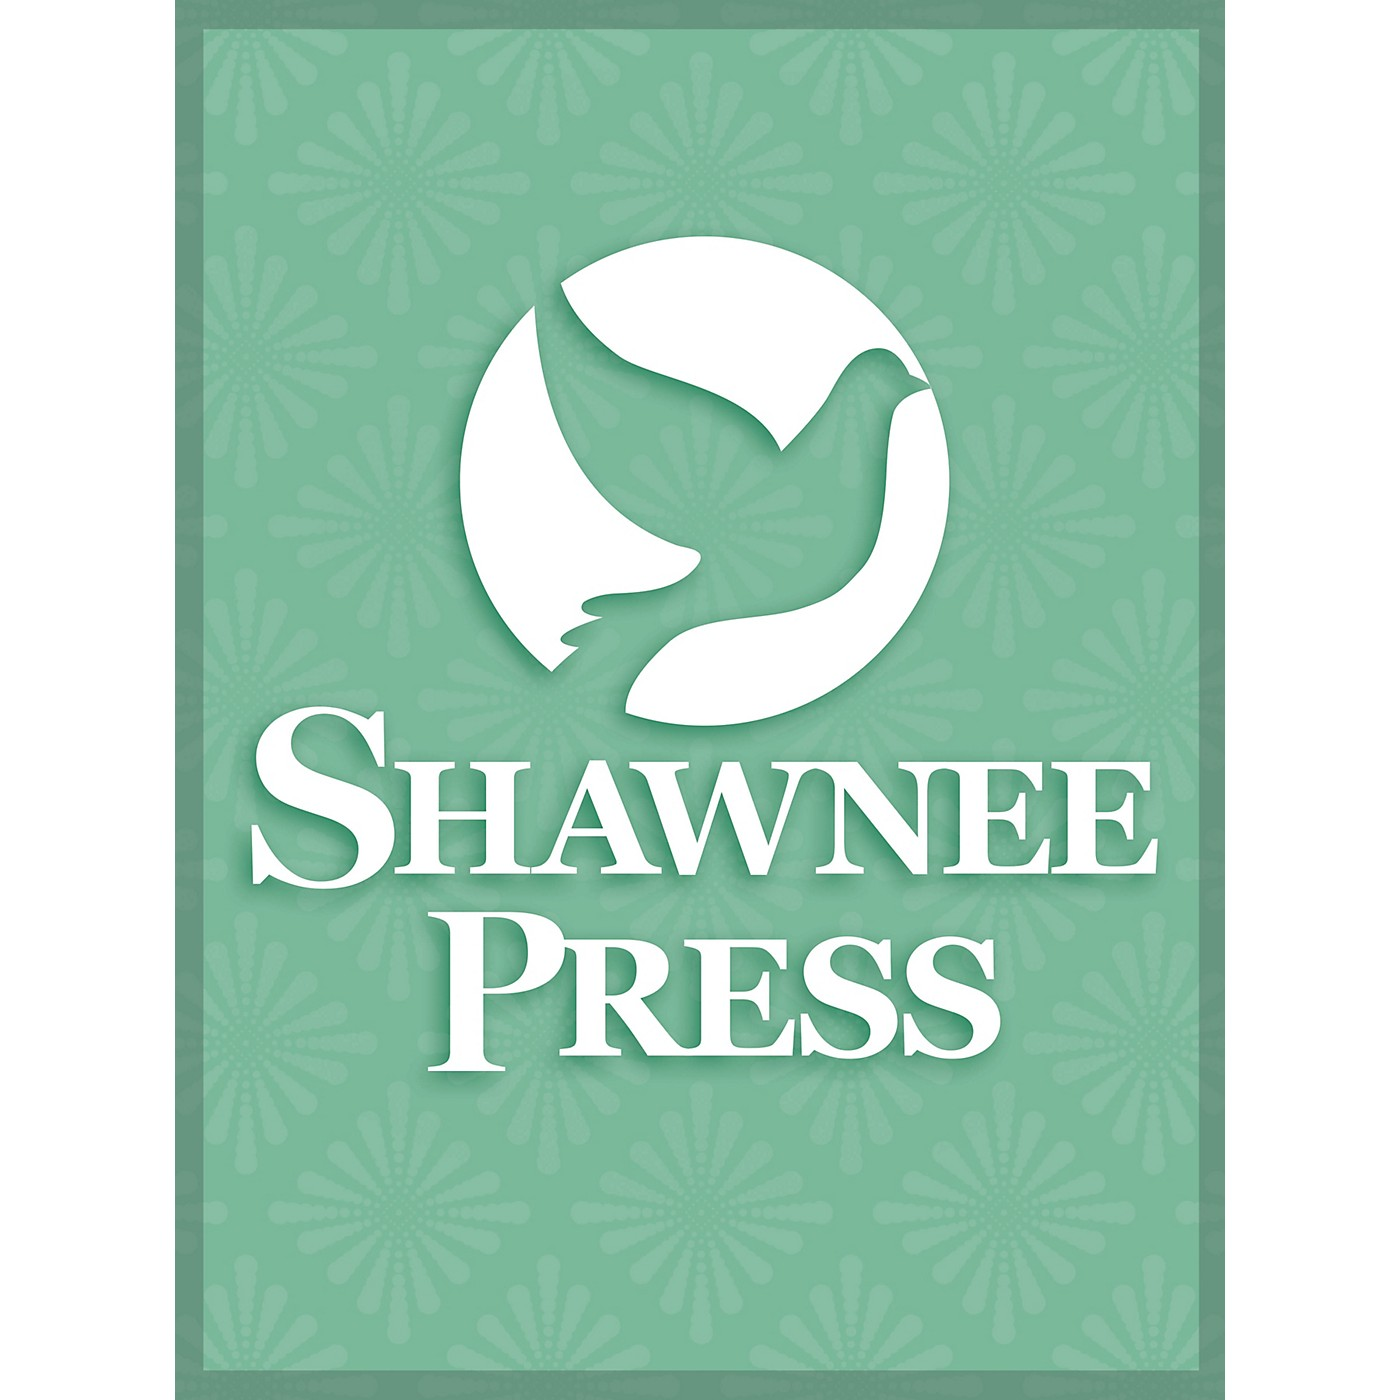 Shawnee Press Suite for Woodwind Quintet (Woodwind Quintet) Shawnee Press Series by Tull thumbnail